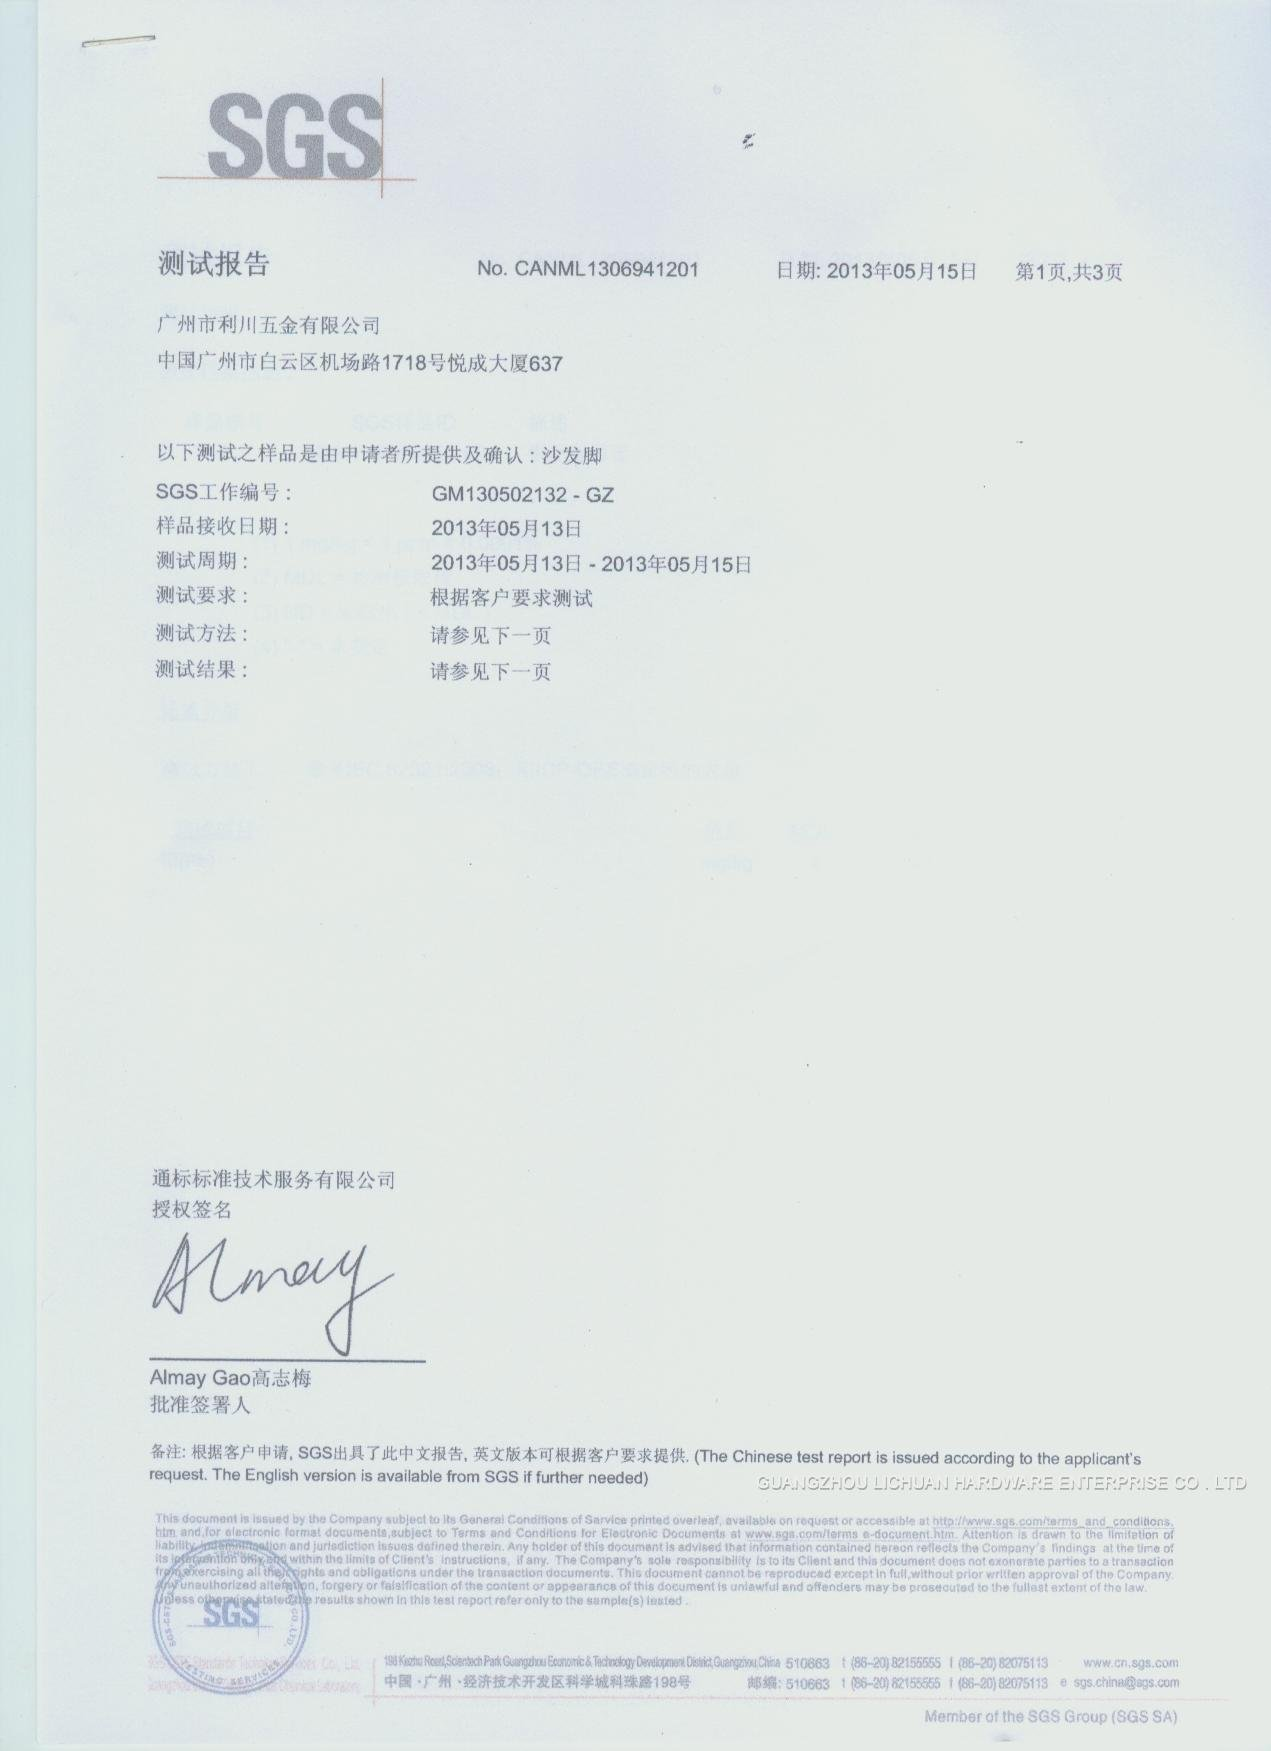 SGS TEST REPORT  SOFA LEG